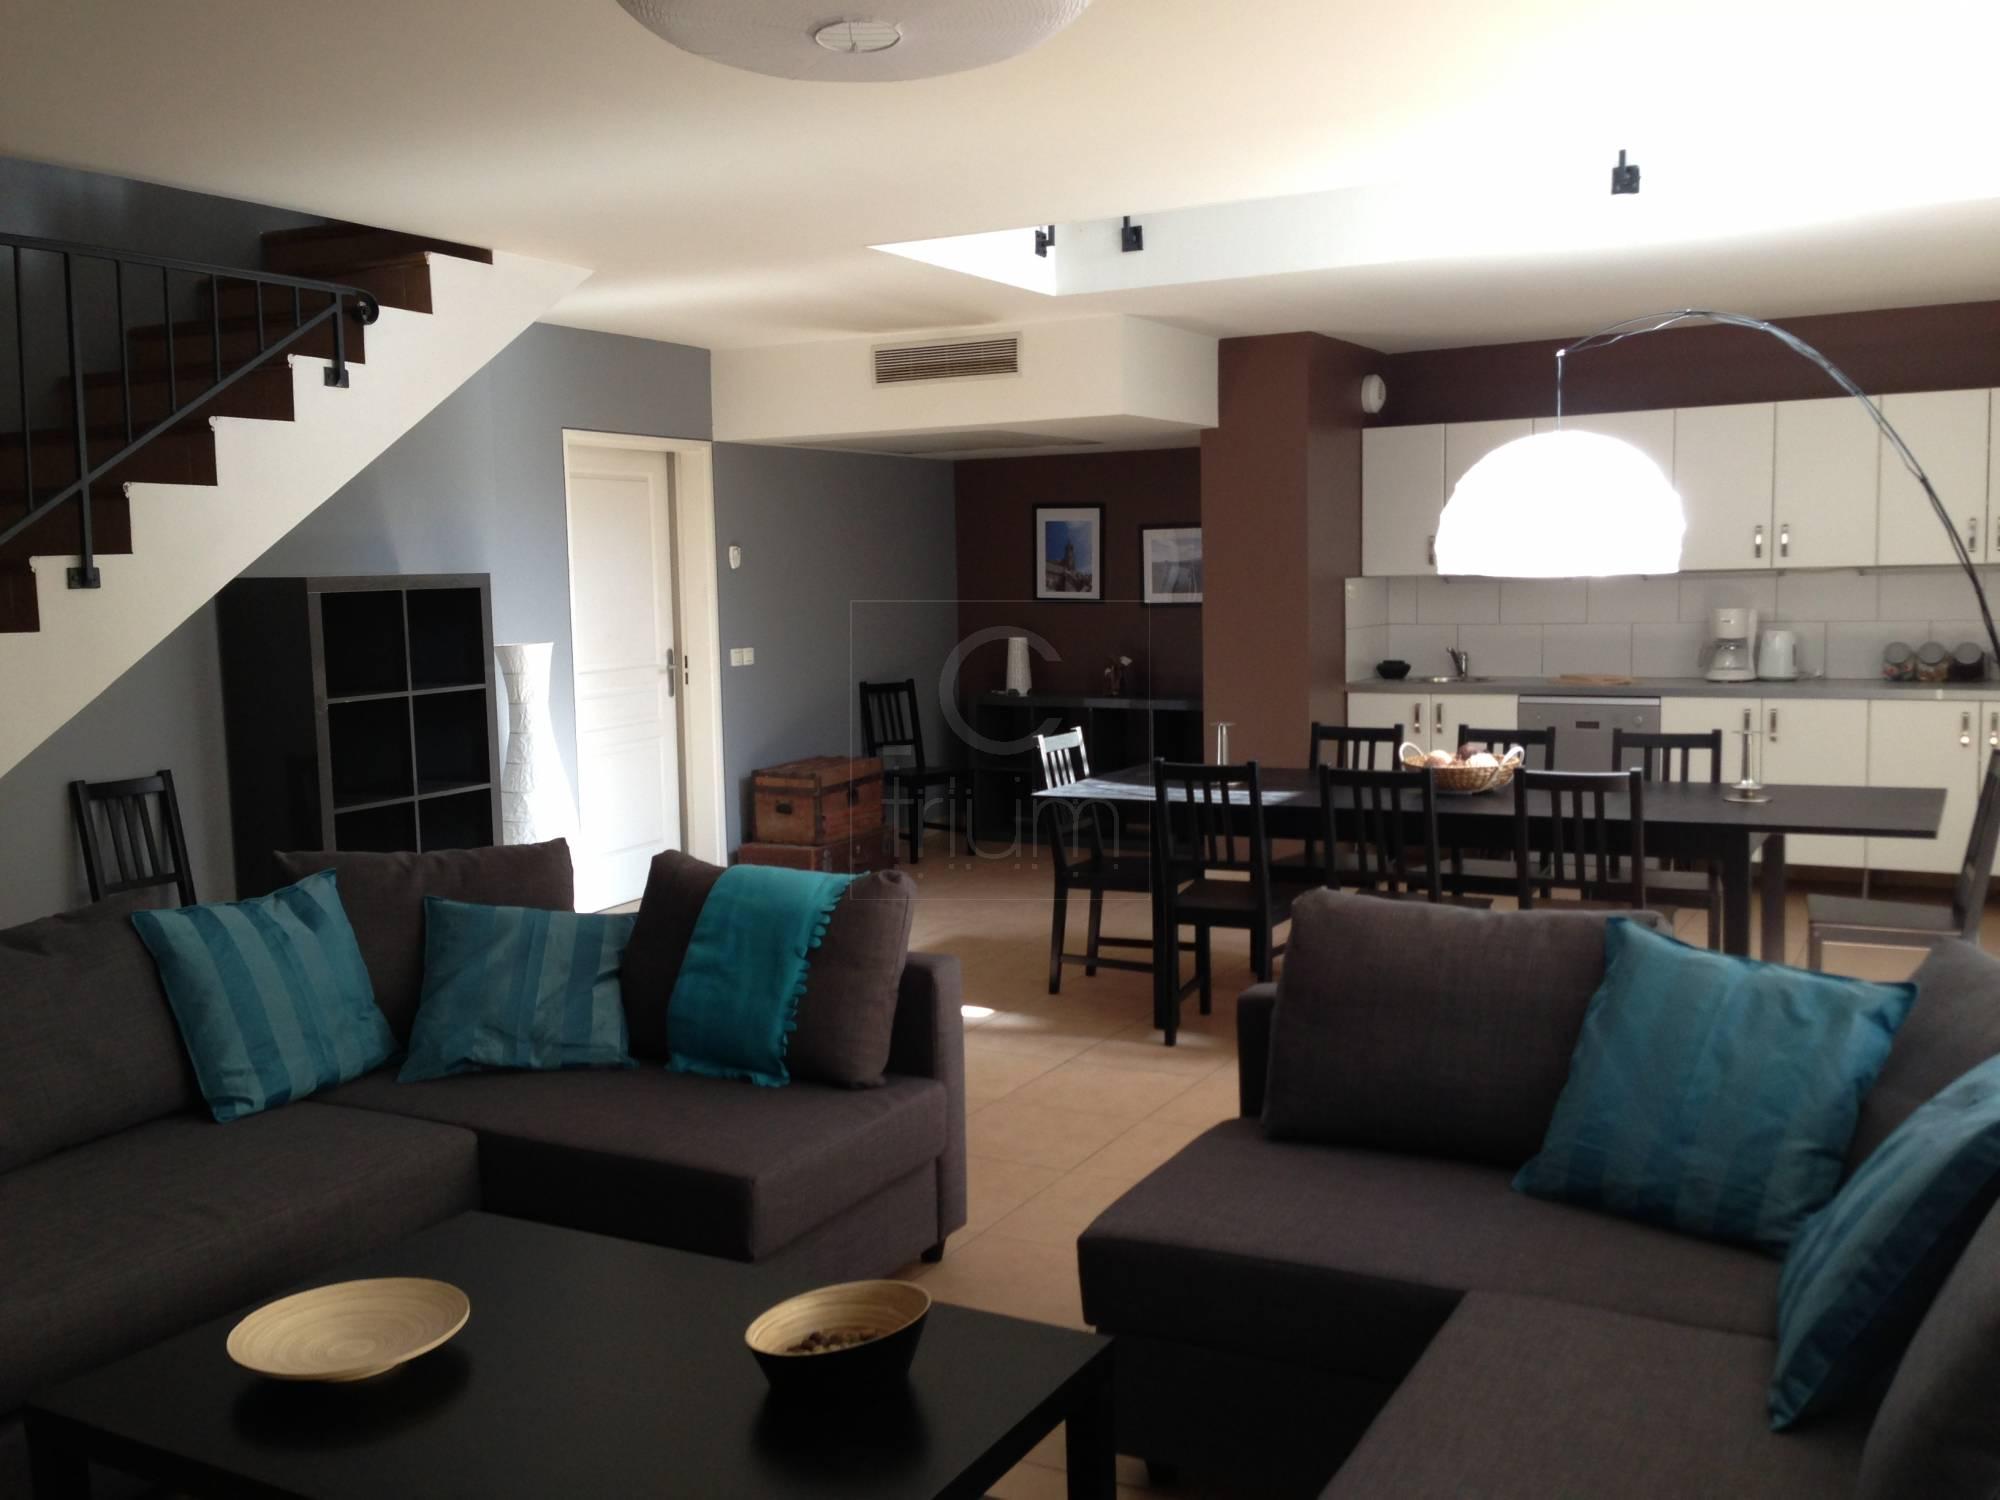 acheter un appartement mes conseils d 39 expert. Black Bedroom Furniture Sets. Home Design Ideas